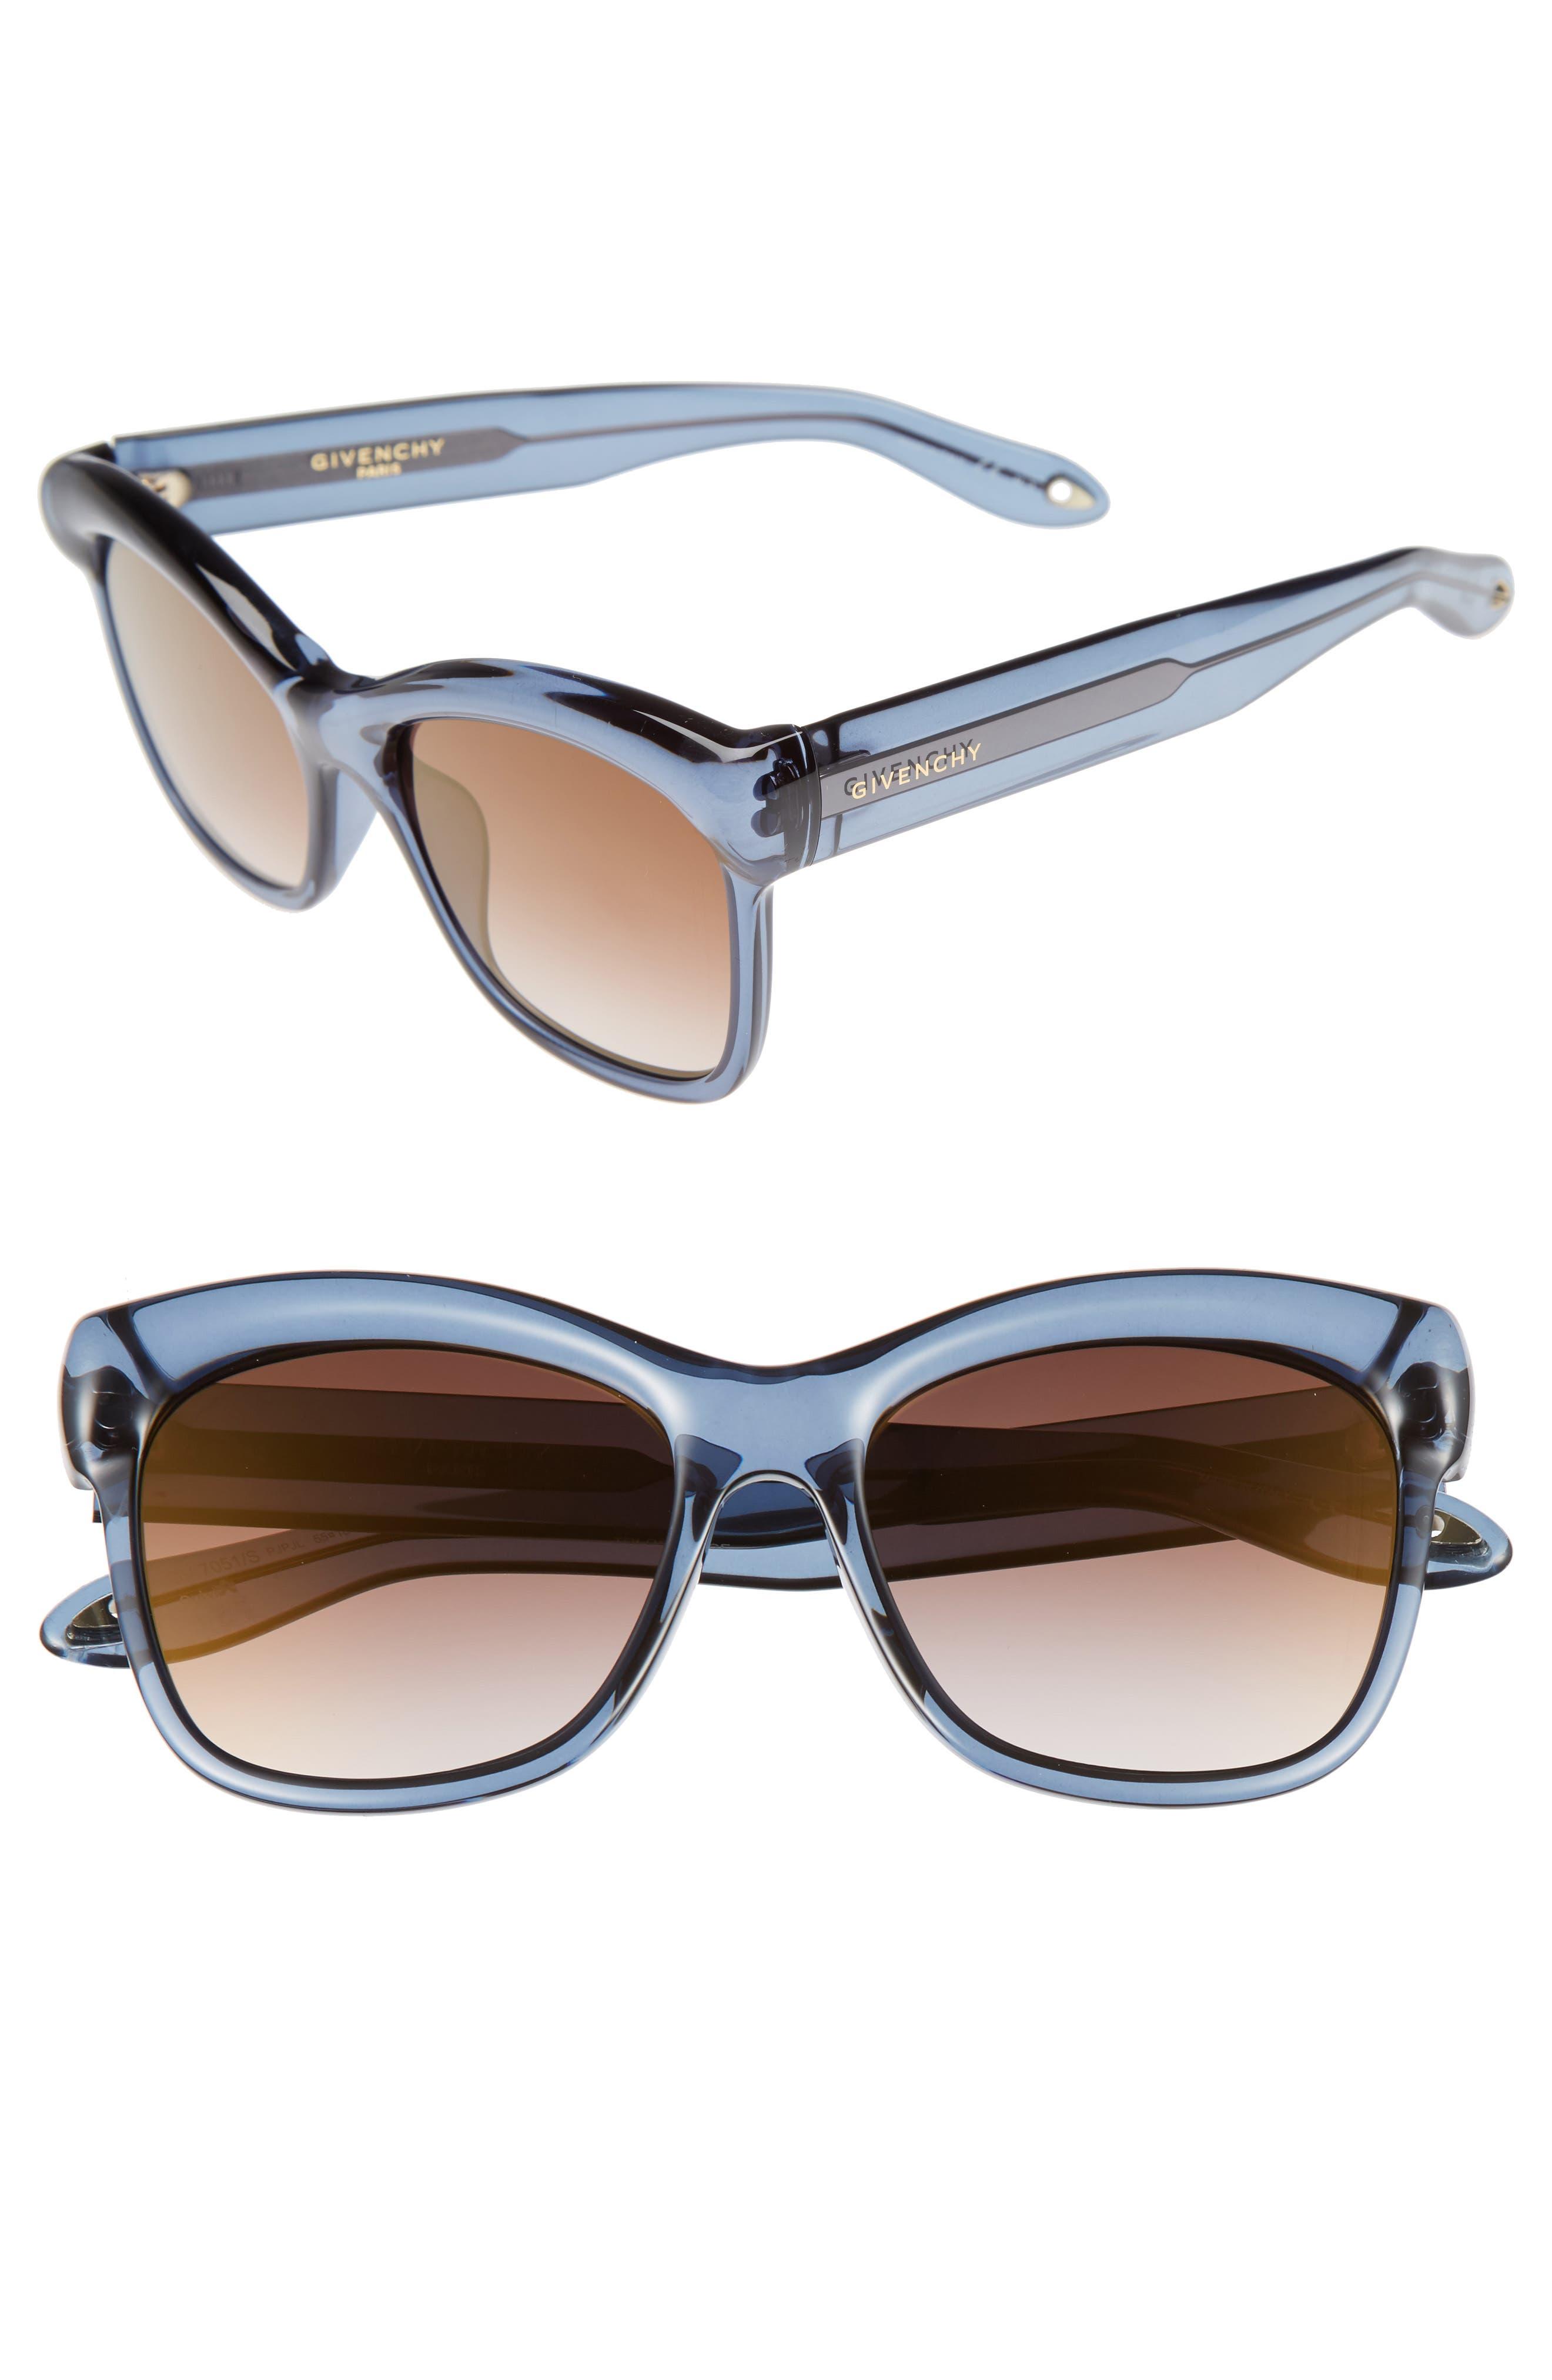 55mm Retro Sunglasses,                         Main,                         color, Blue